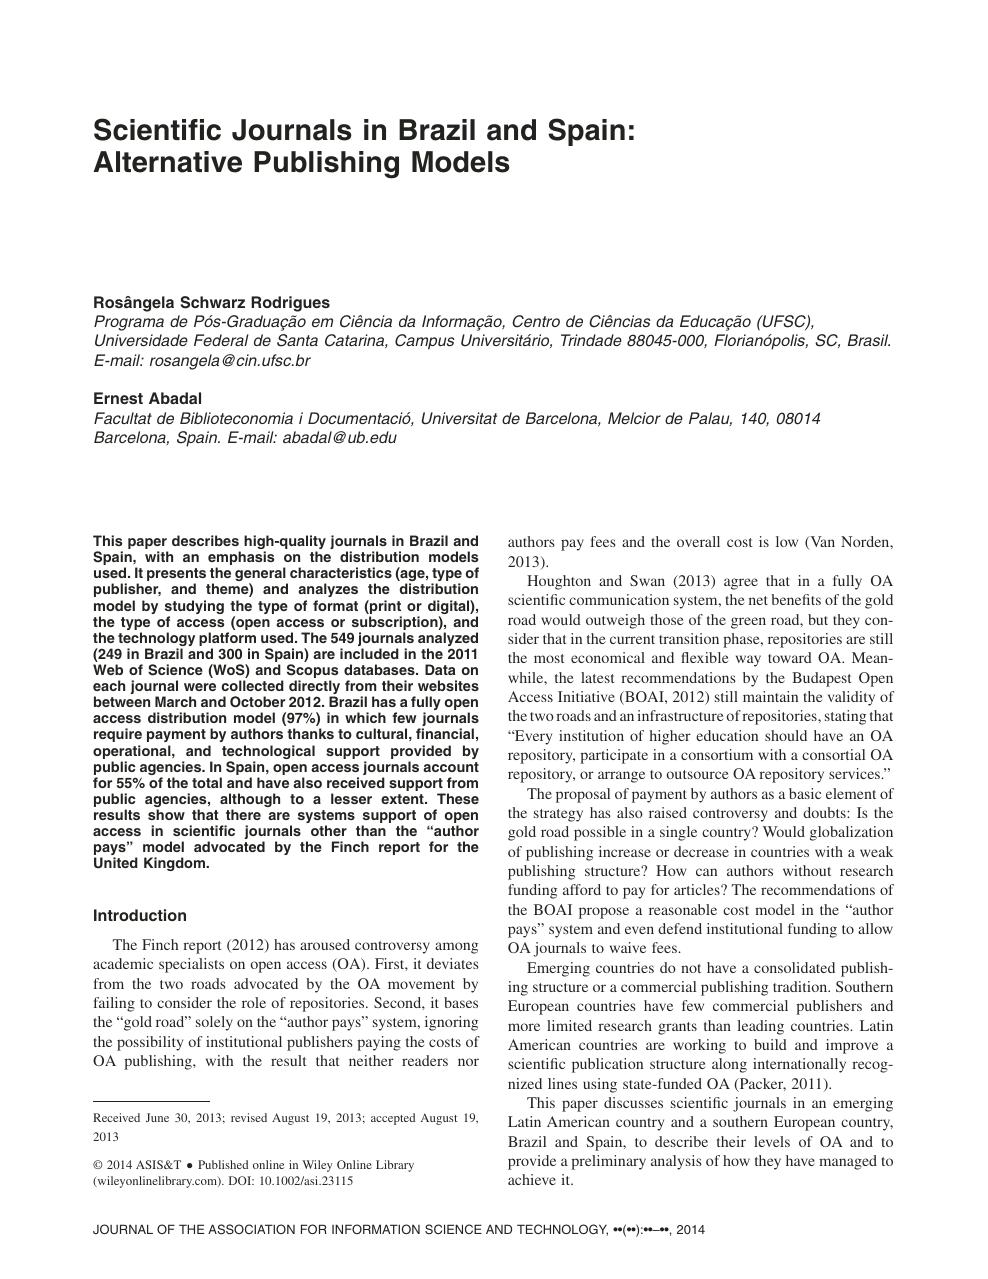 Scientific journals in Brazil and Spain: Alternative